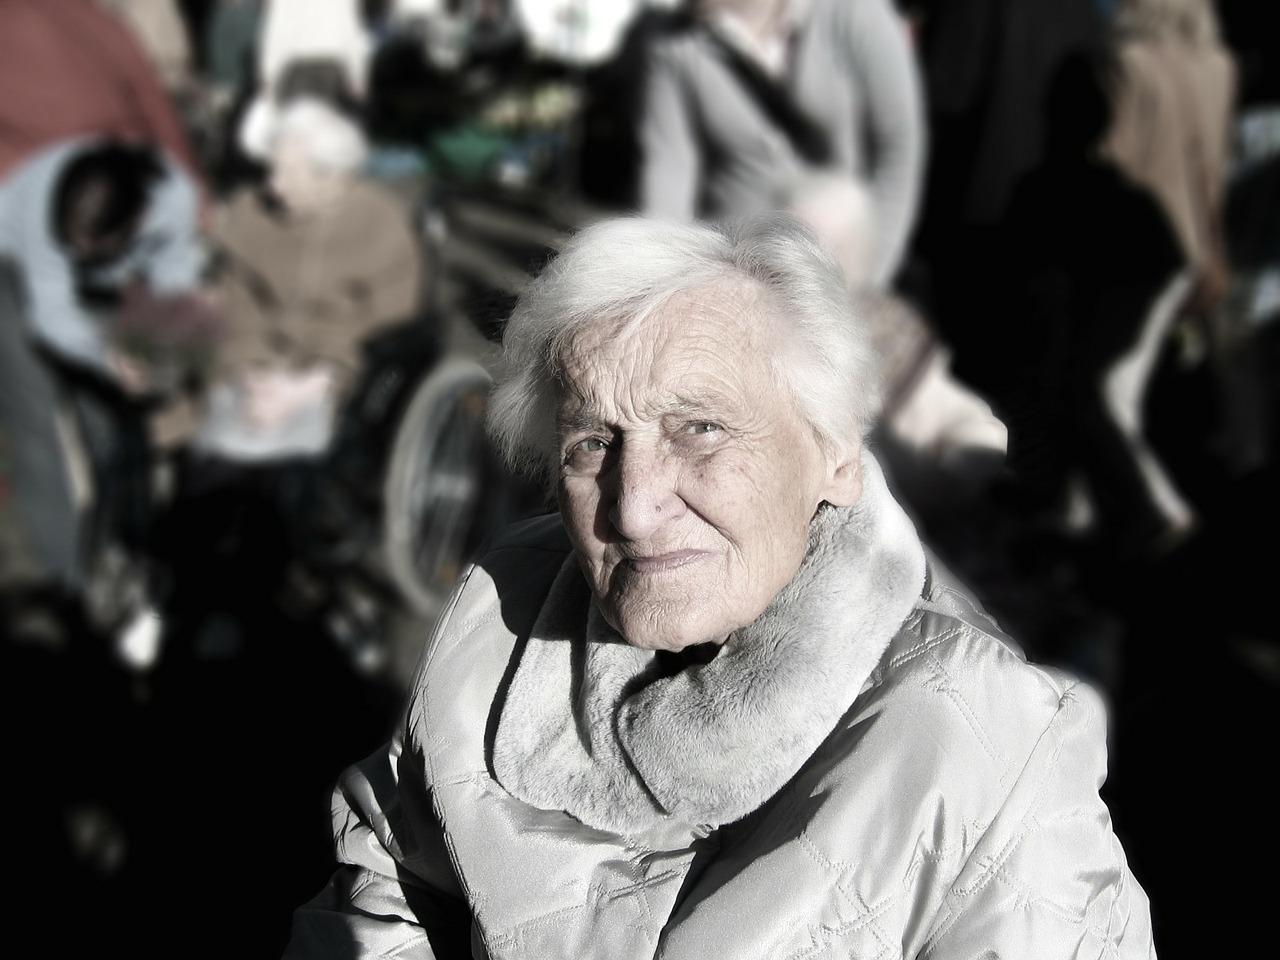 dementia risks, dementia, am coffee, amcoffee, health